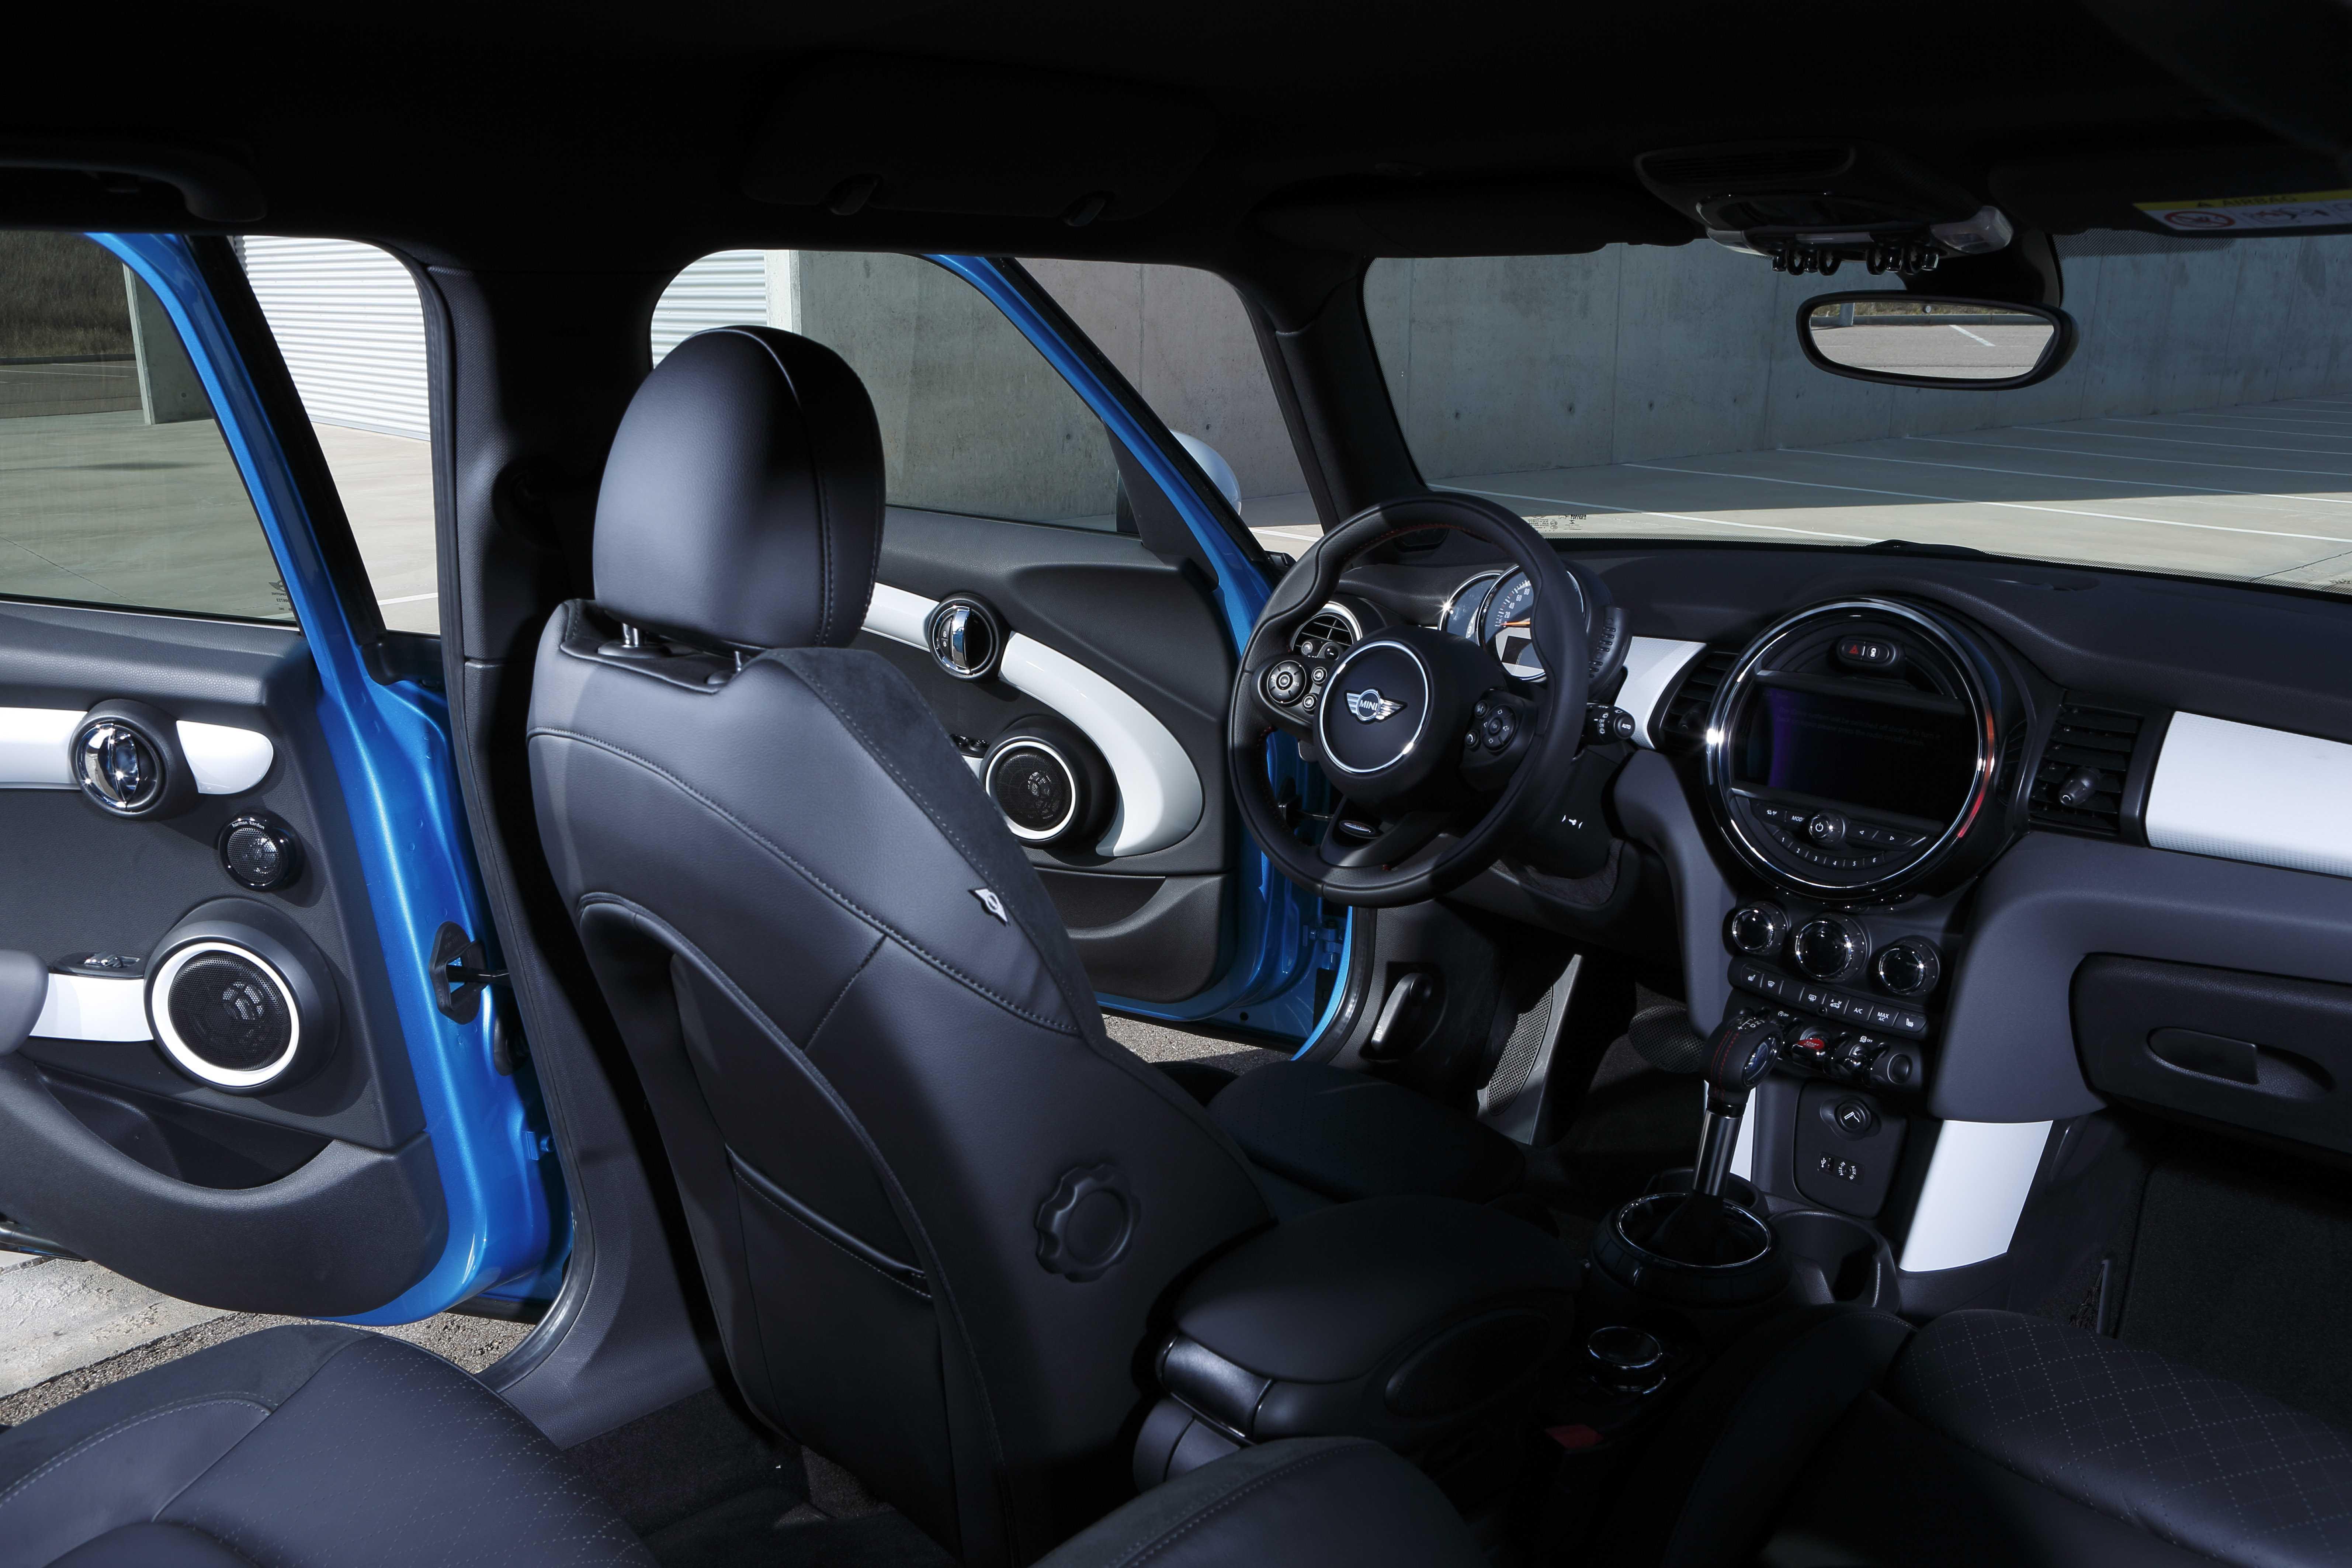 mini 5 porte test su strada 136 cv motorage new generation. Black Bedroom Furniture Sets. Home Design Ideas